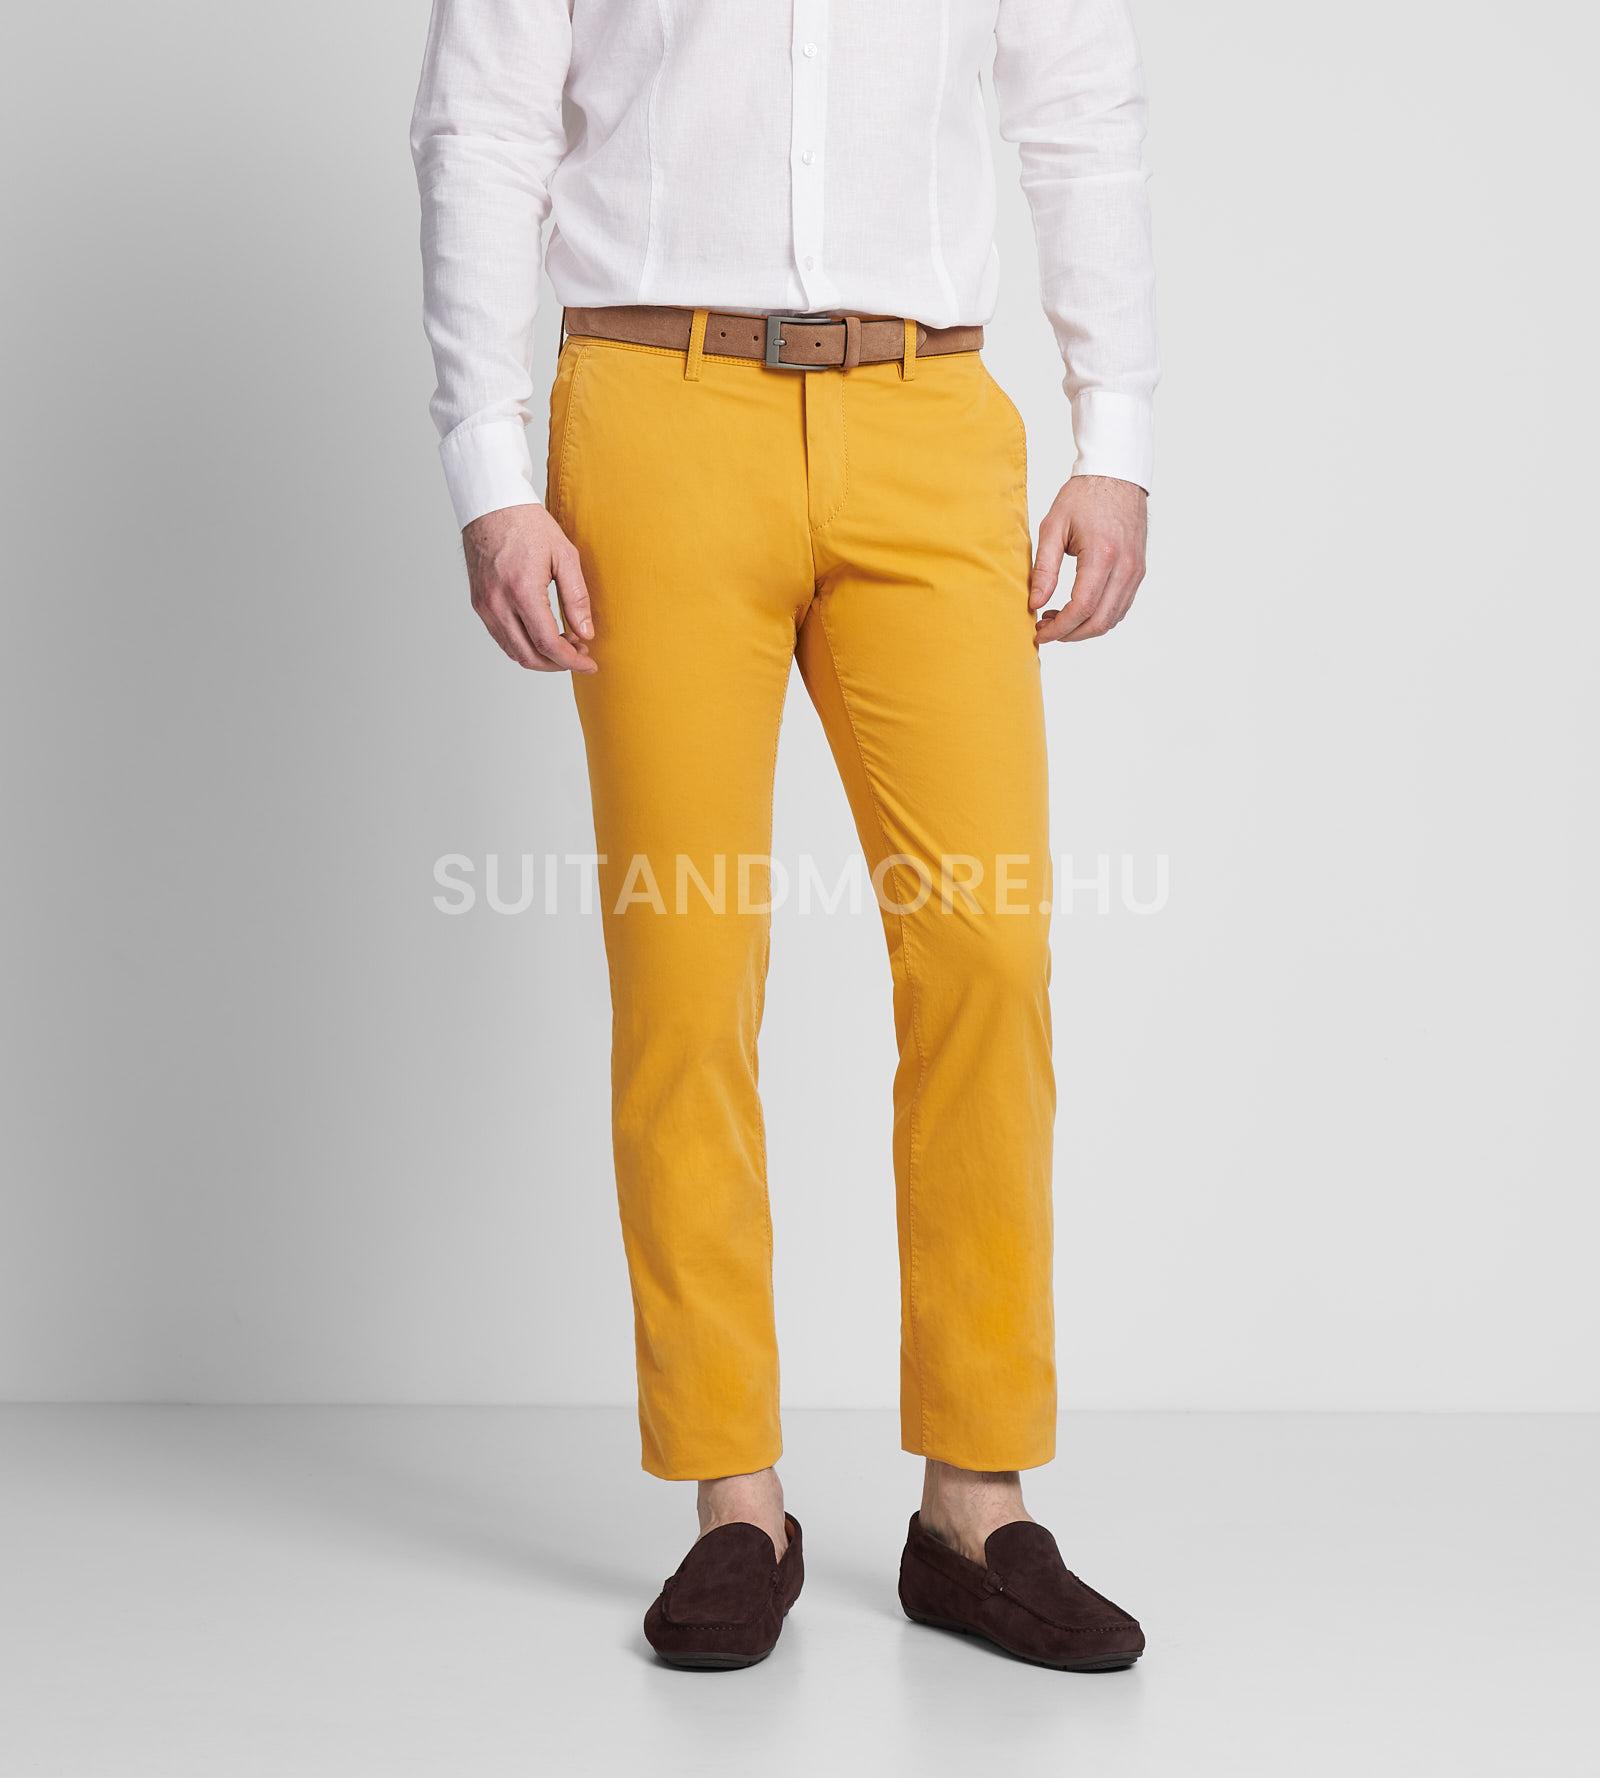 digel-narancssarga-extra-slim-fit-pamut-sztreccs-chino-nadrag-nigel-88164-94